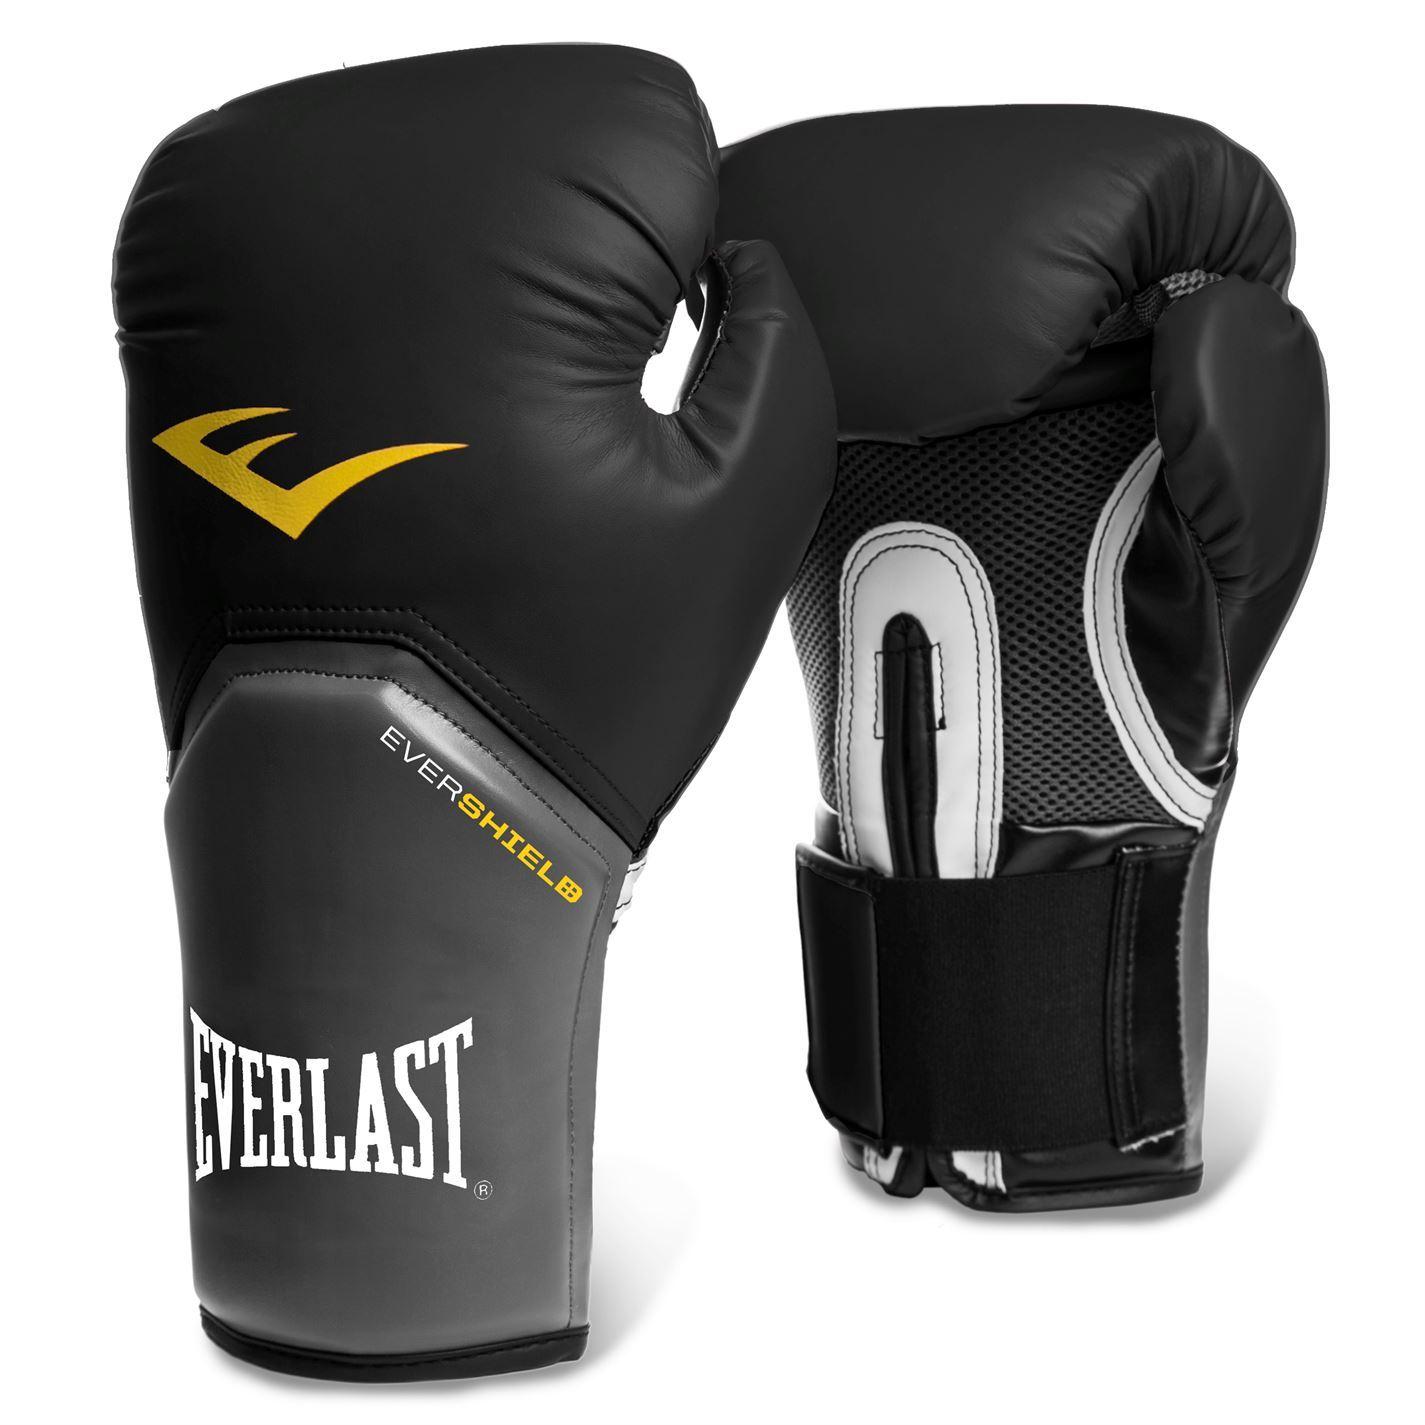 Everlast Elite Training Evershield Boxing Gloves Gym Fitness Bag Sparring Gloves